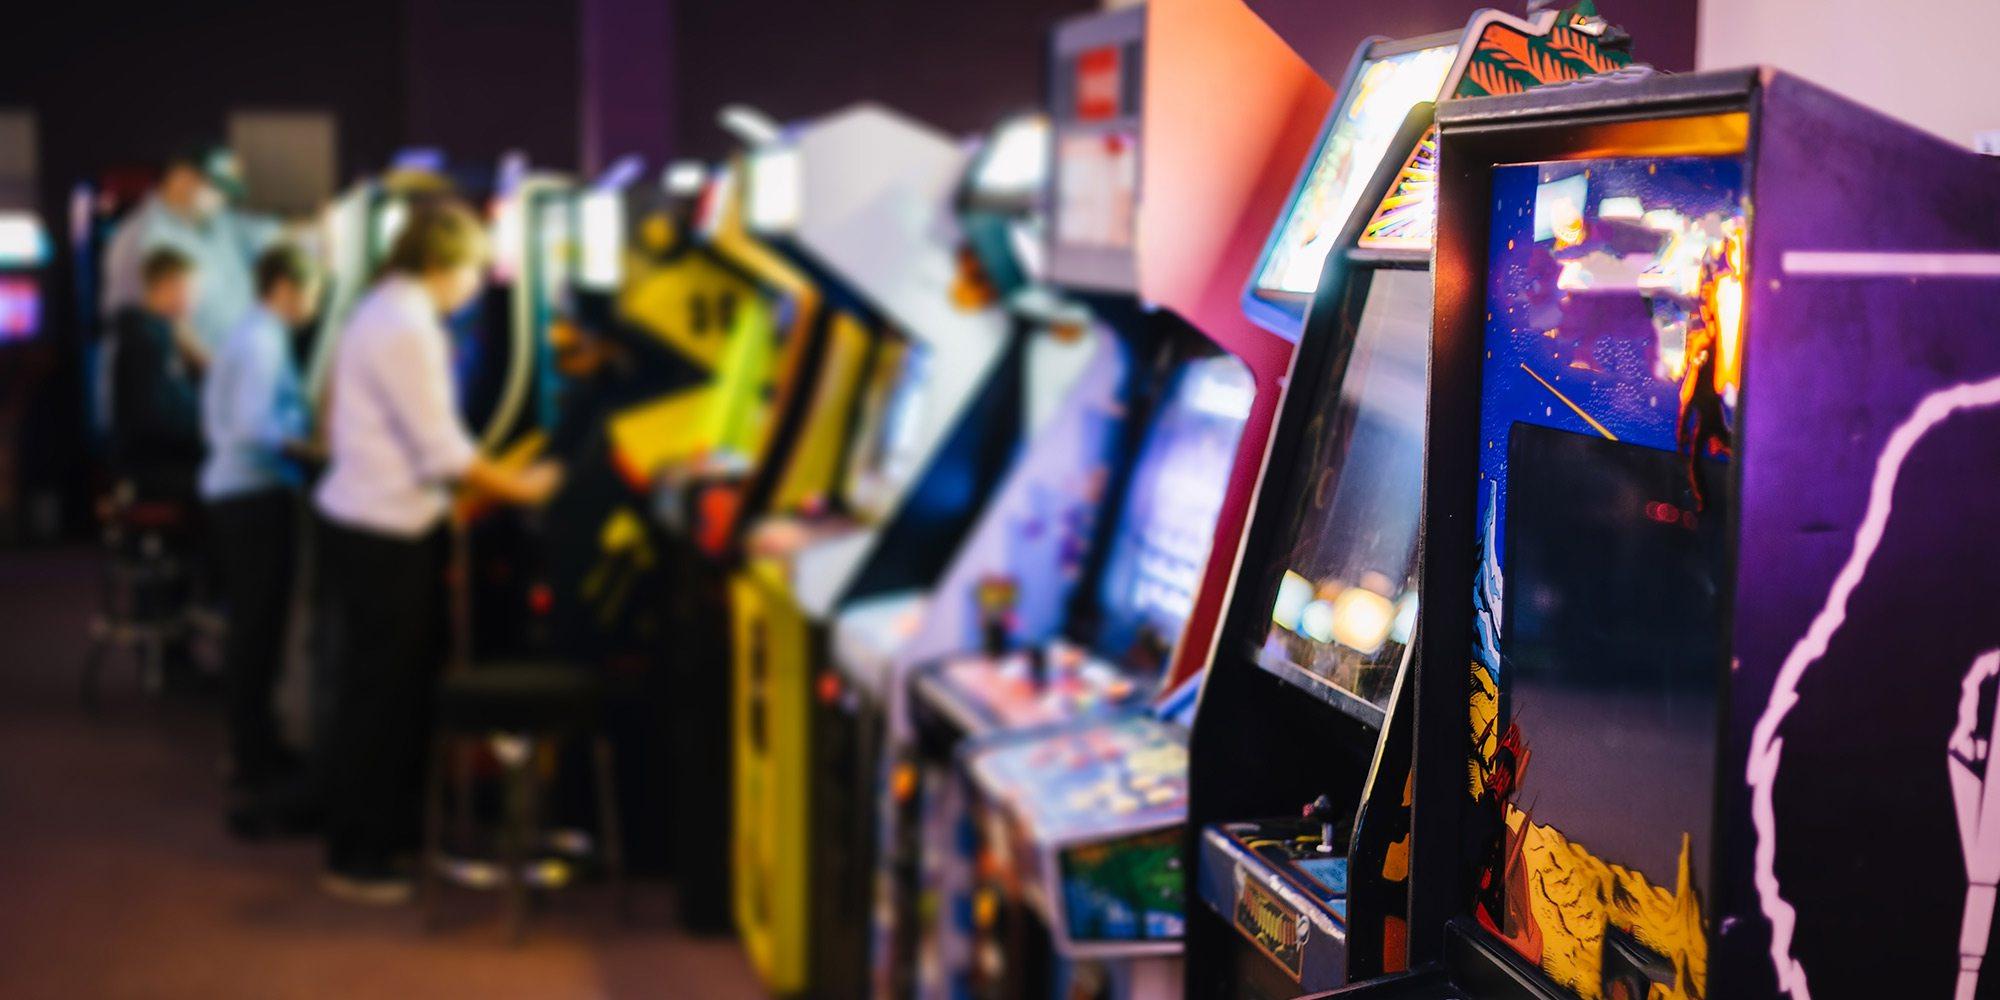 1984 Arcade in Springfield, MO